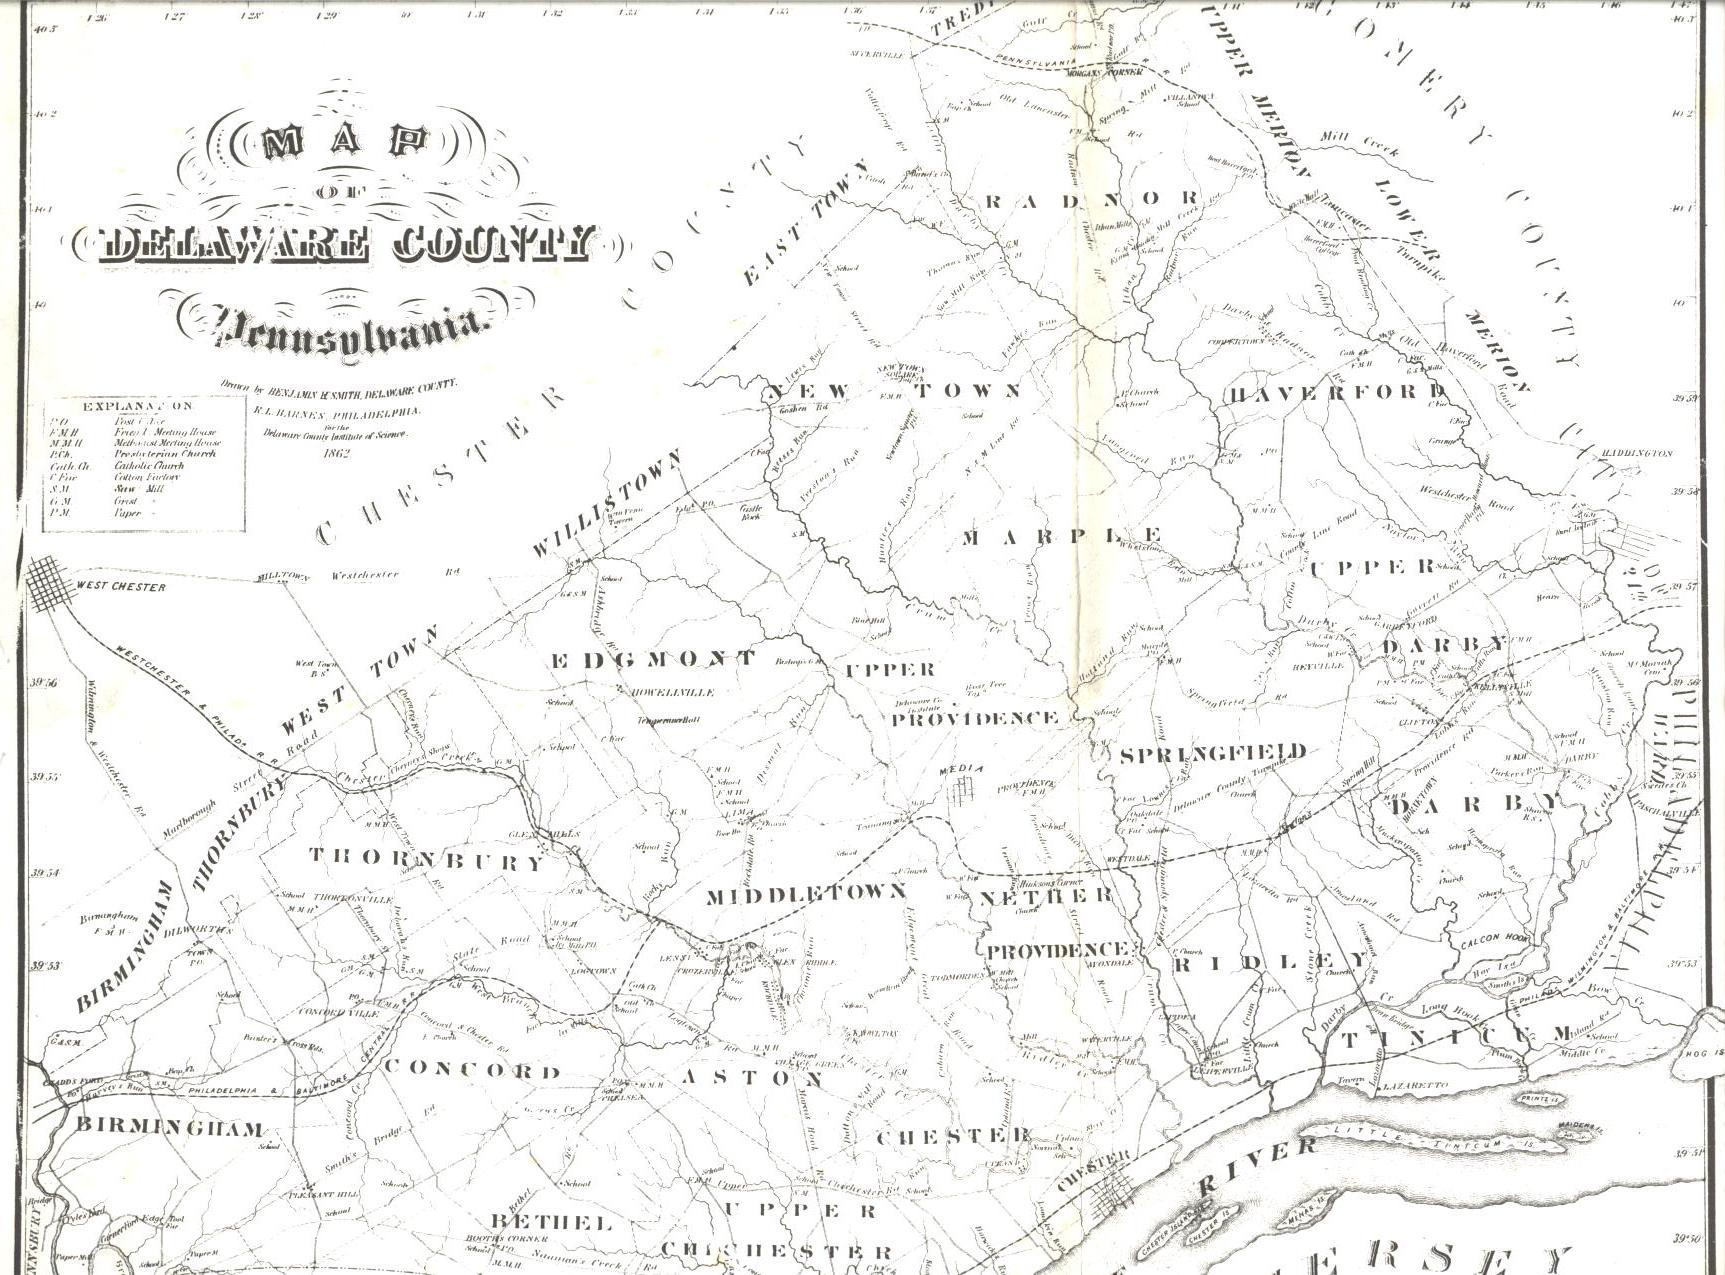 Delaware County Warrantee Atlas on